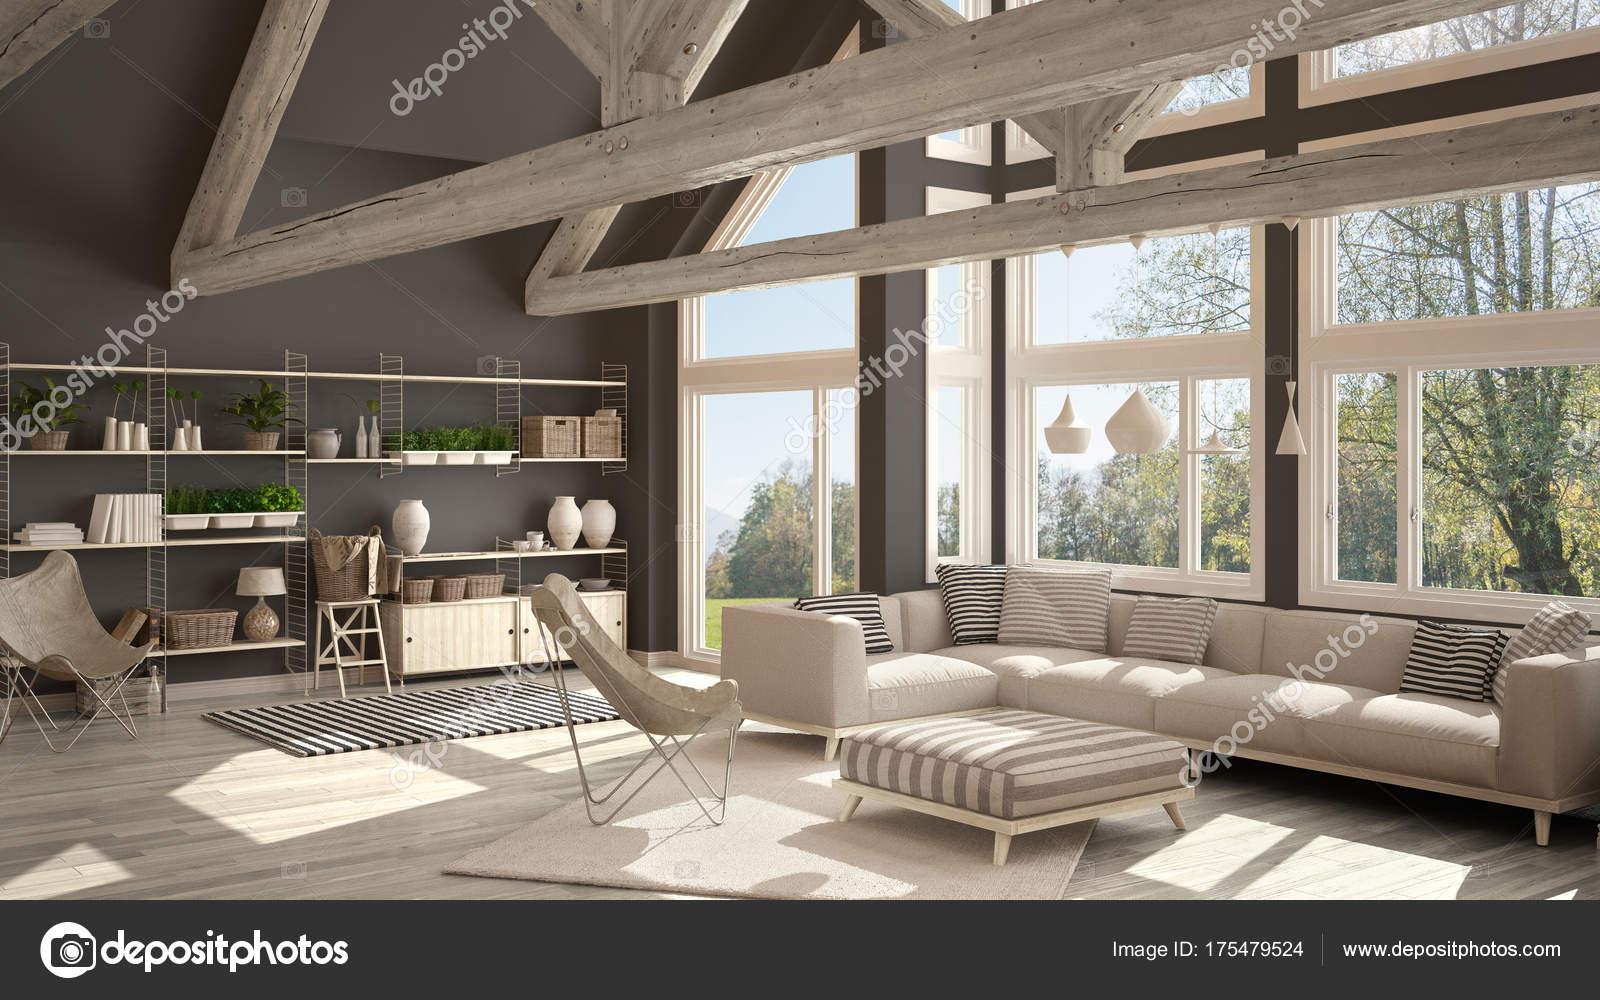 Living Room Of Luxury Eco House Parquet Floor And Wooden Roof T Stock Photo C Archiviz 175479524